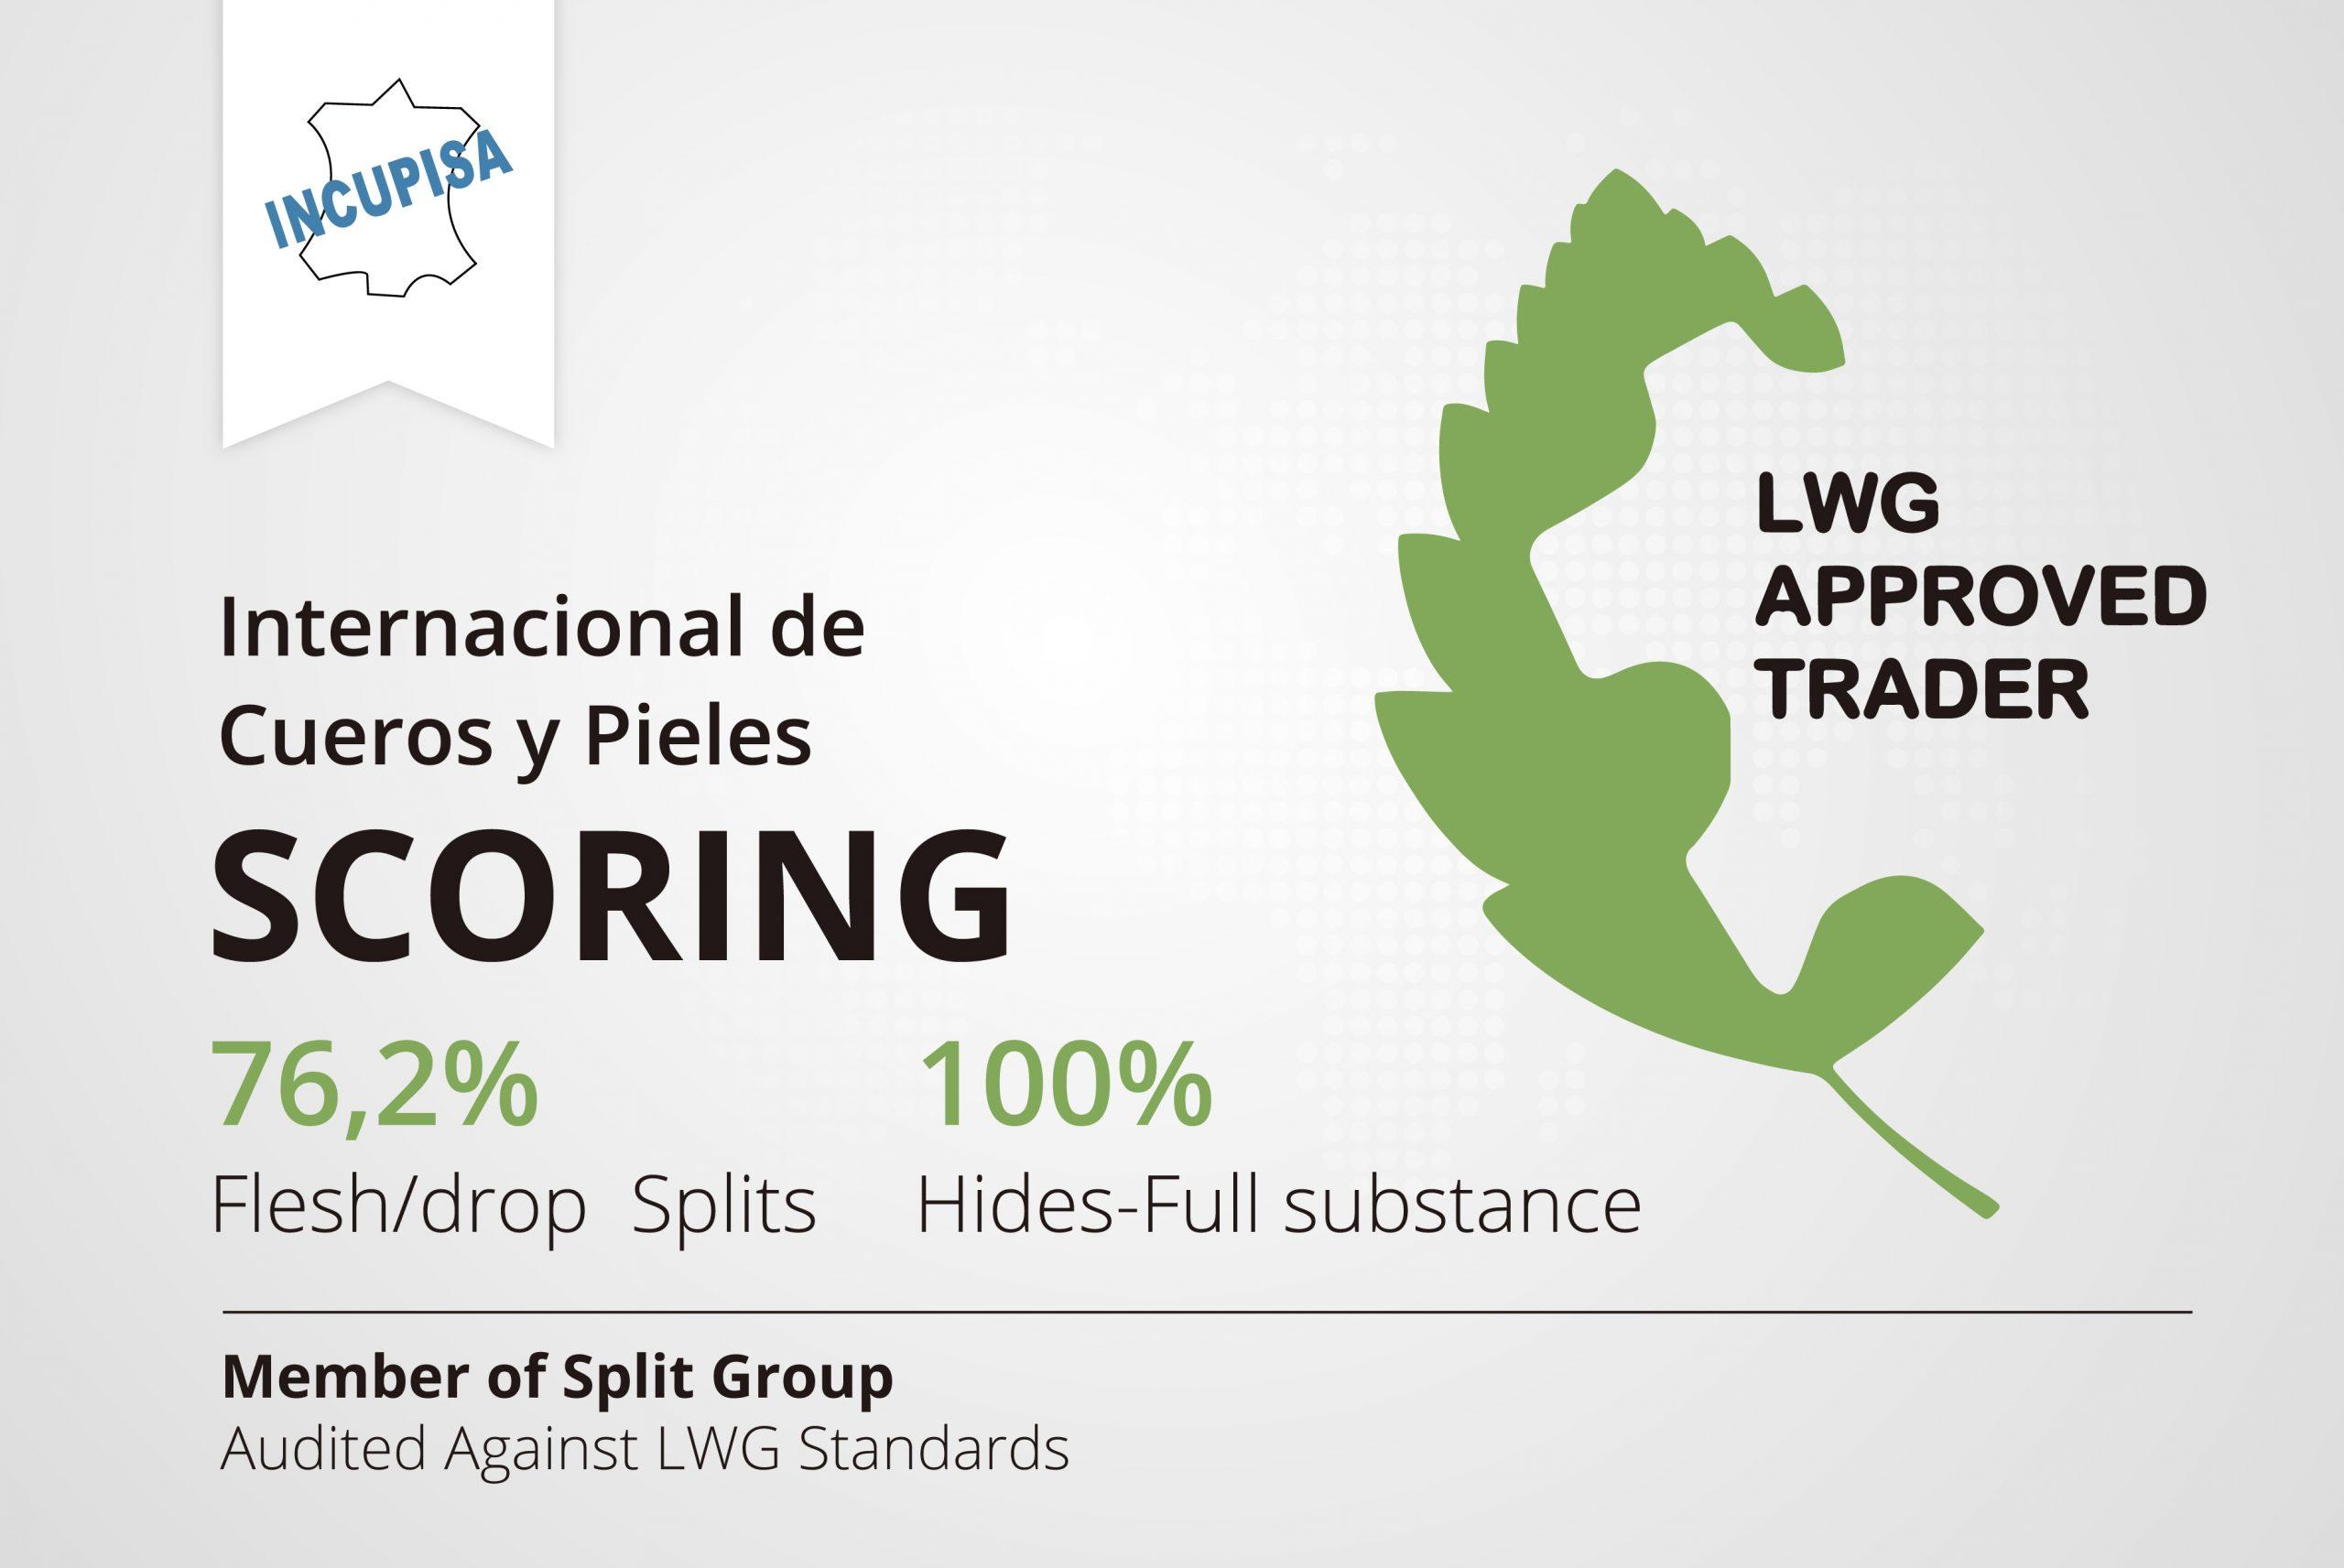 Incupisa LWG re-audit